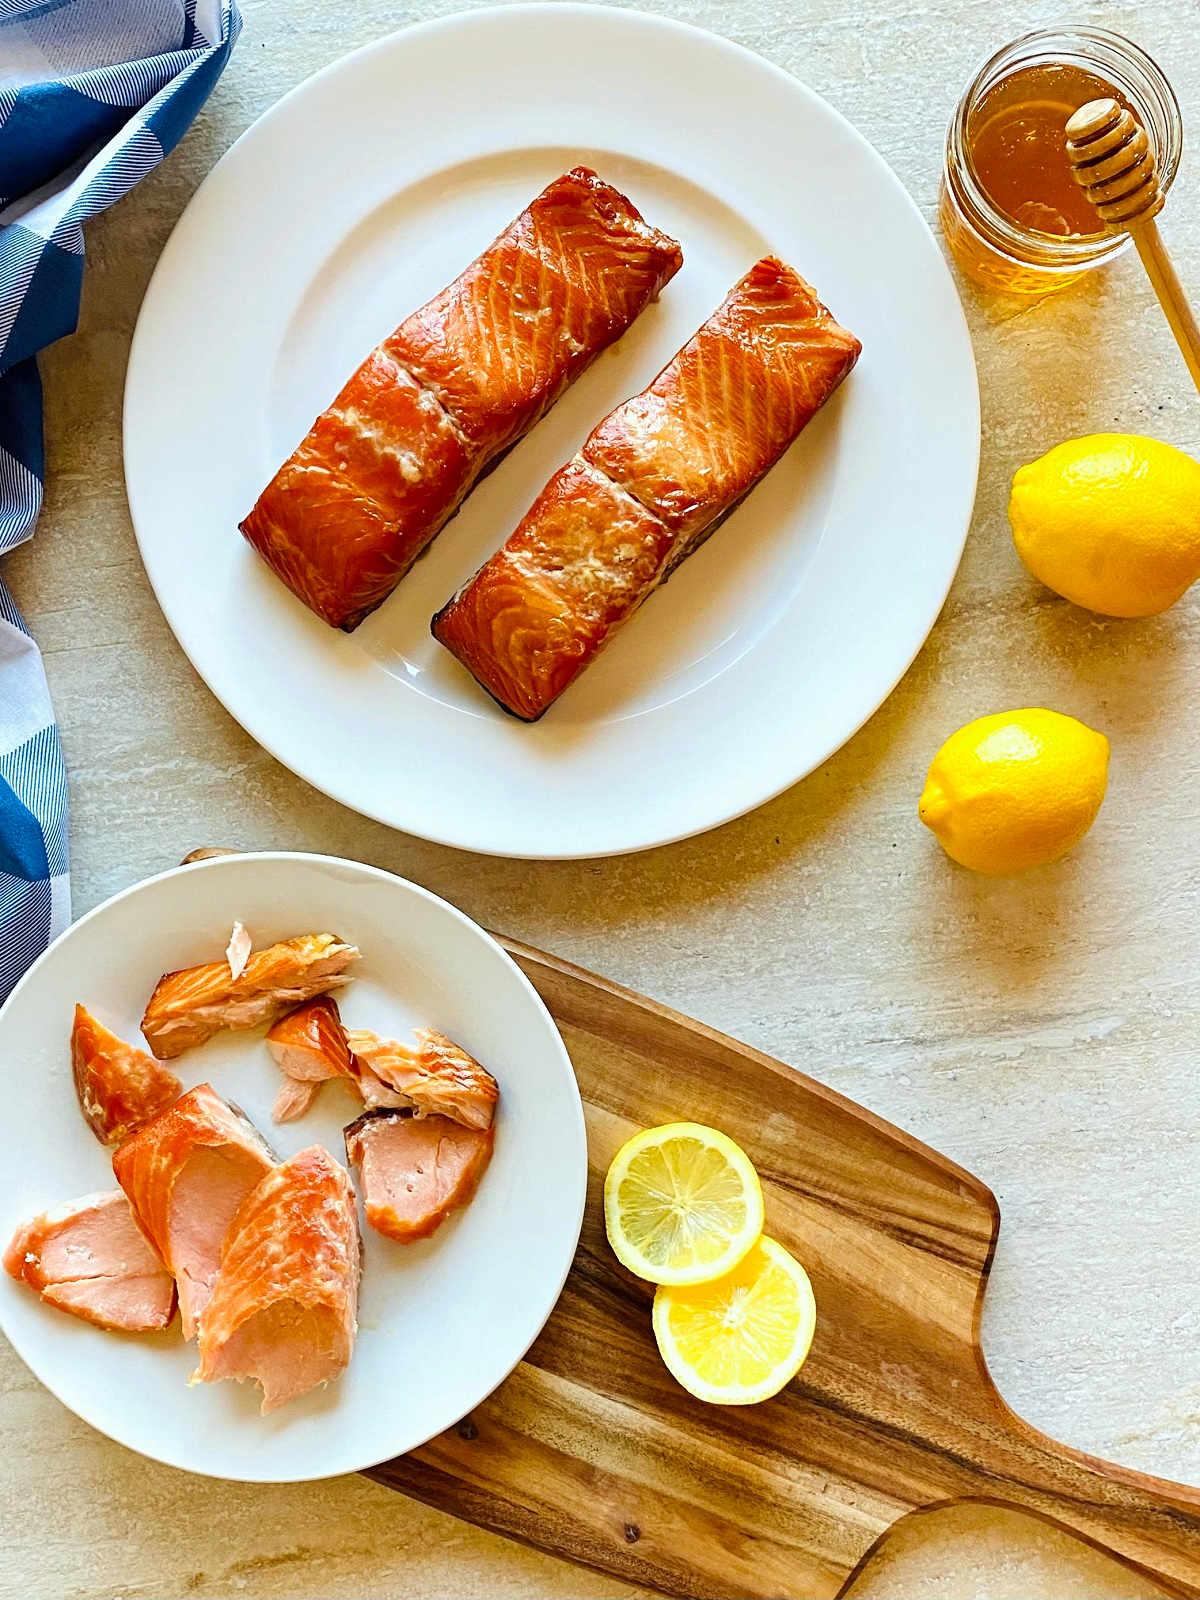 honey smoked salmon on a plate next to honey and lemons